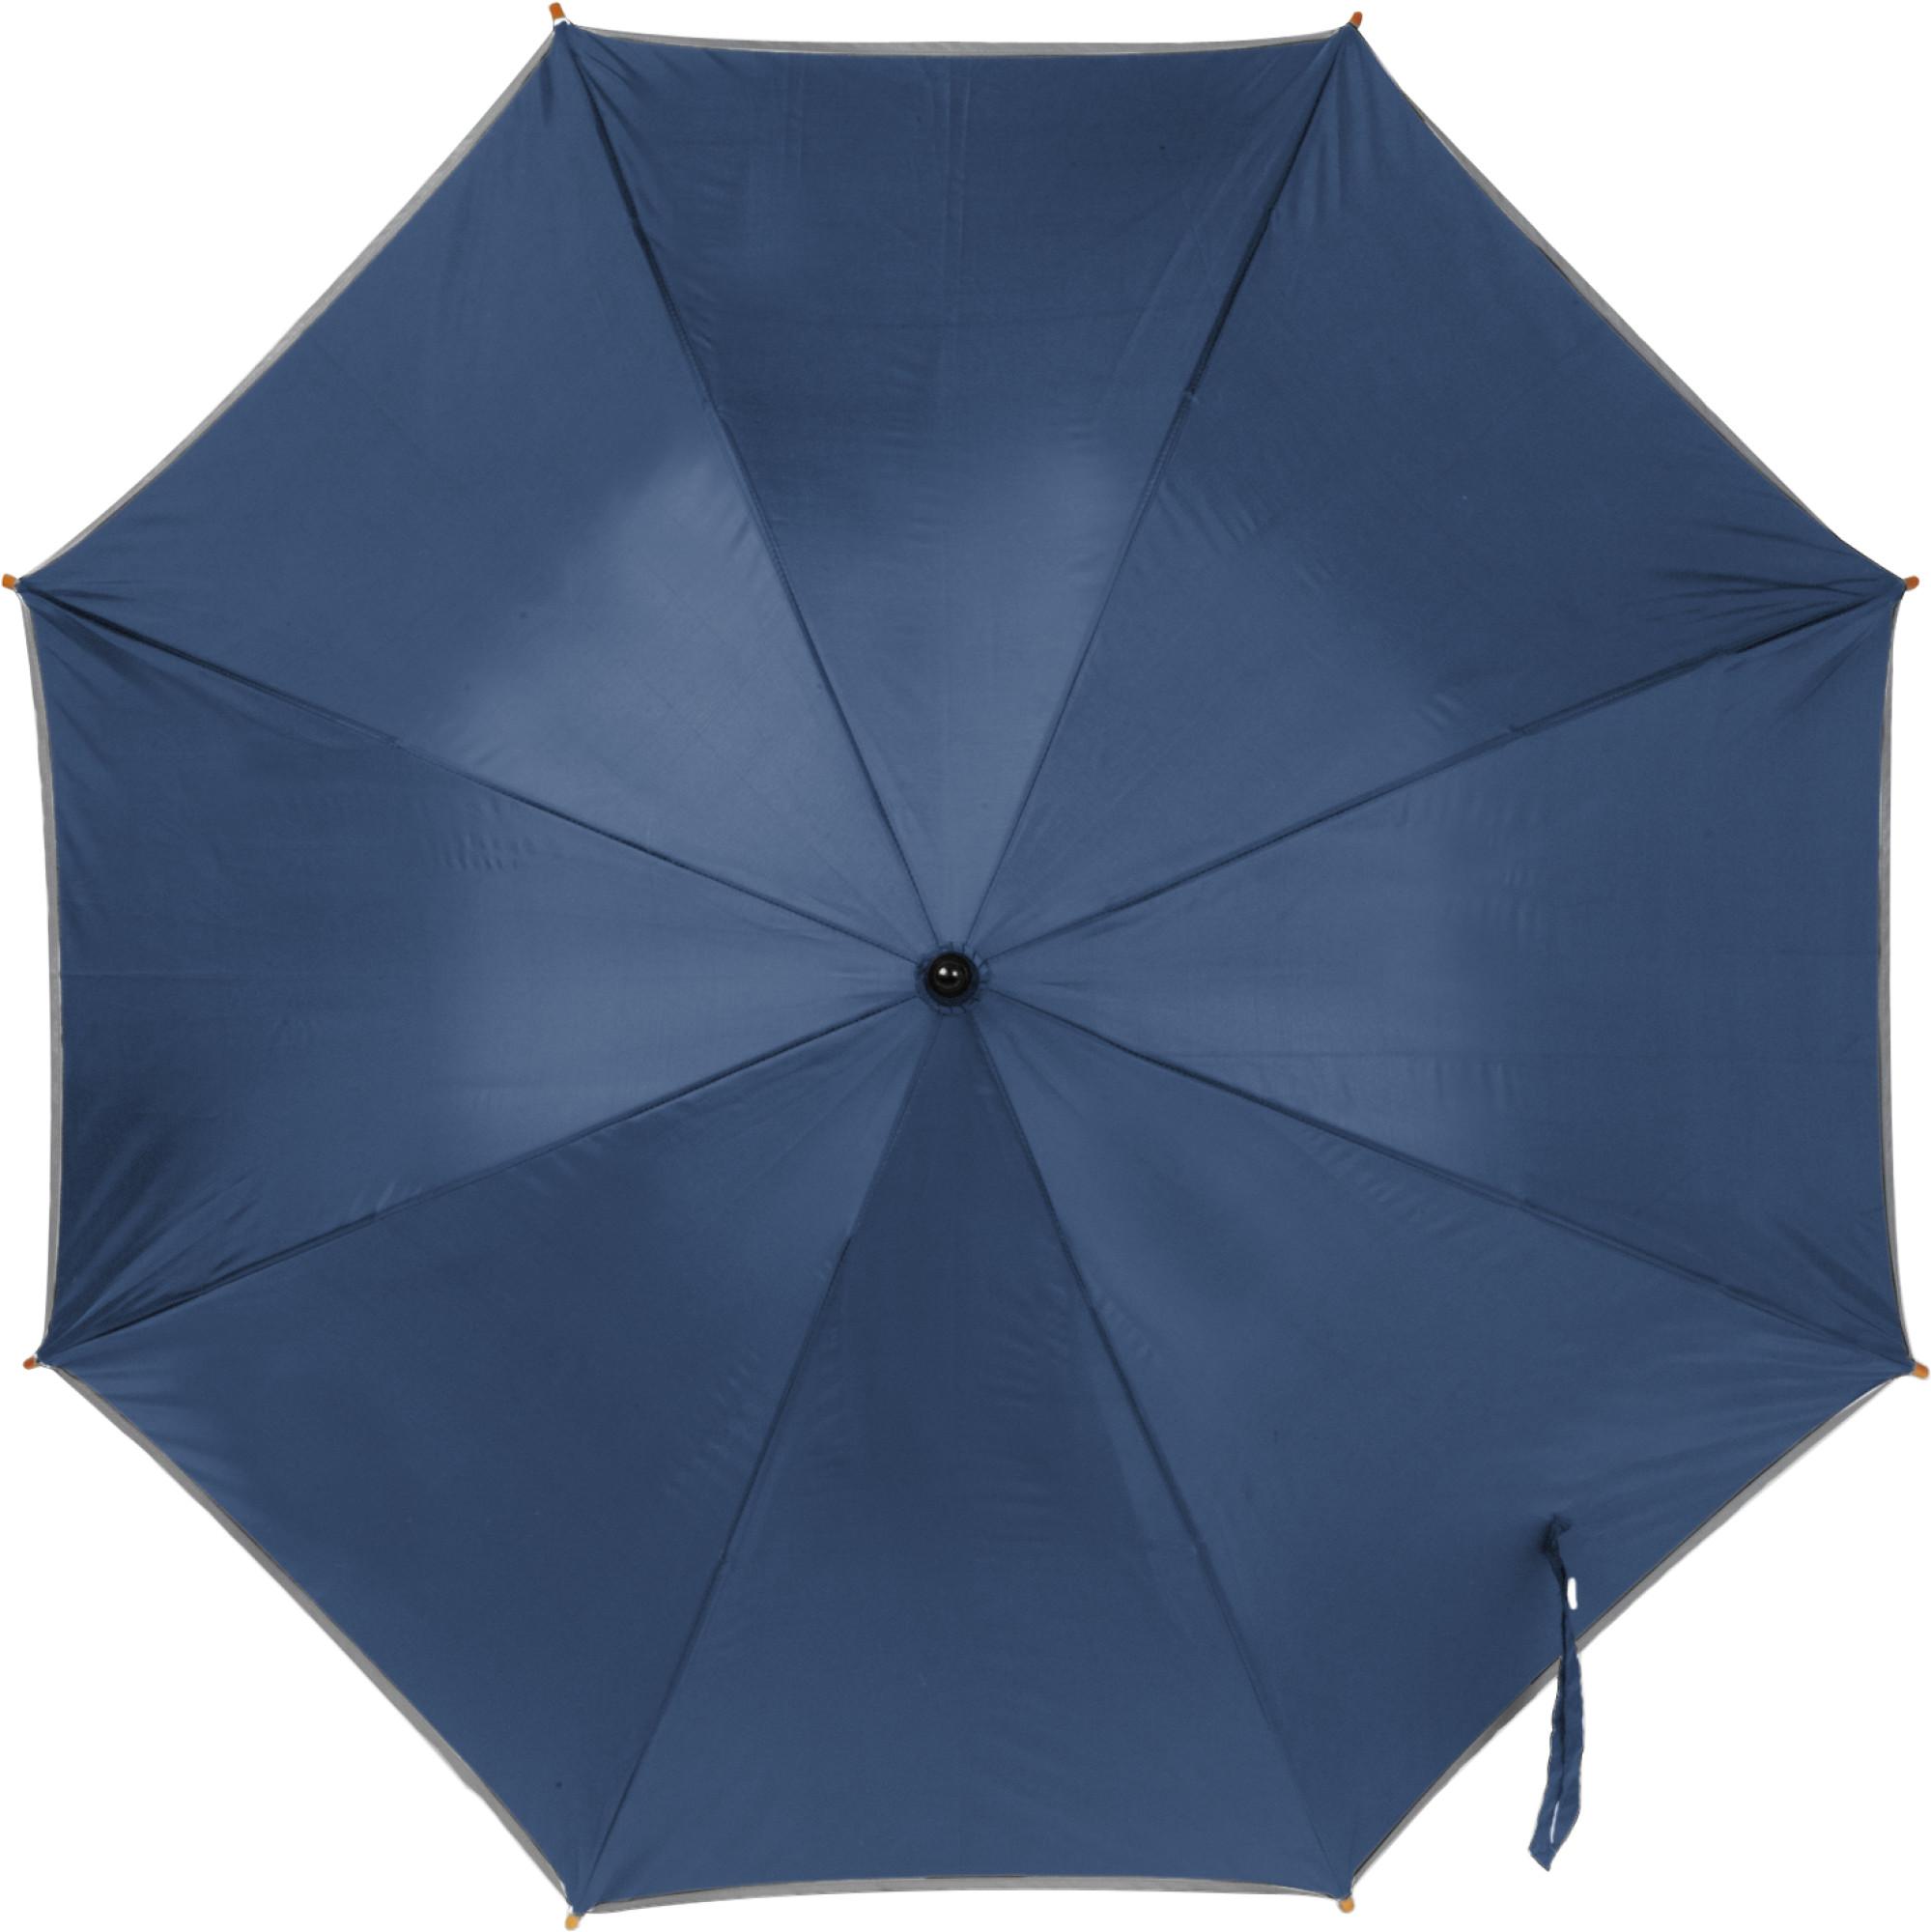 Printed Umbrella with reflective border